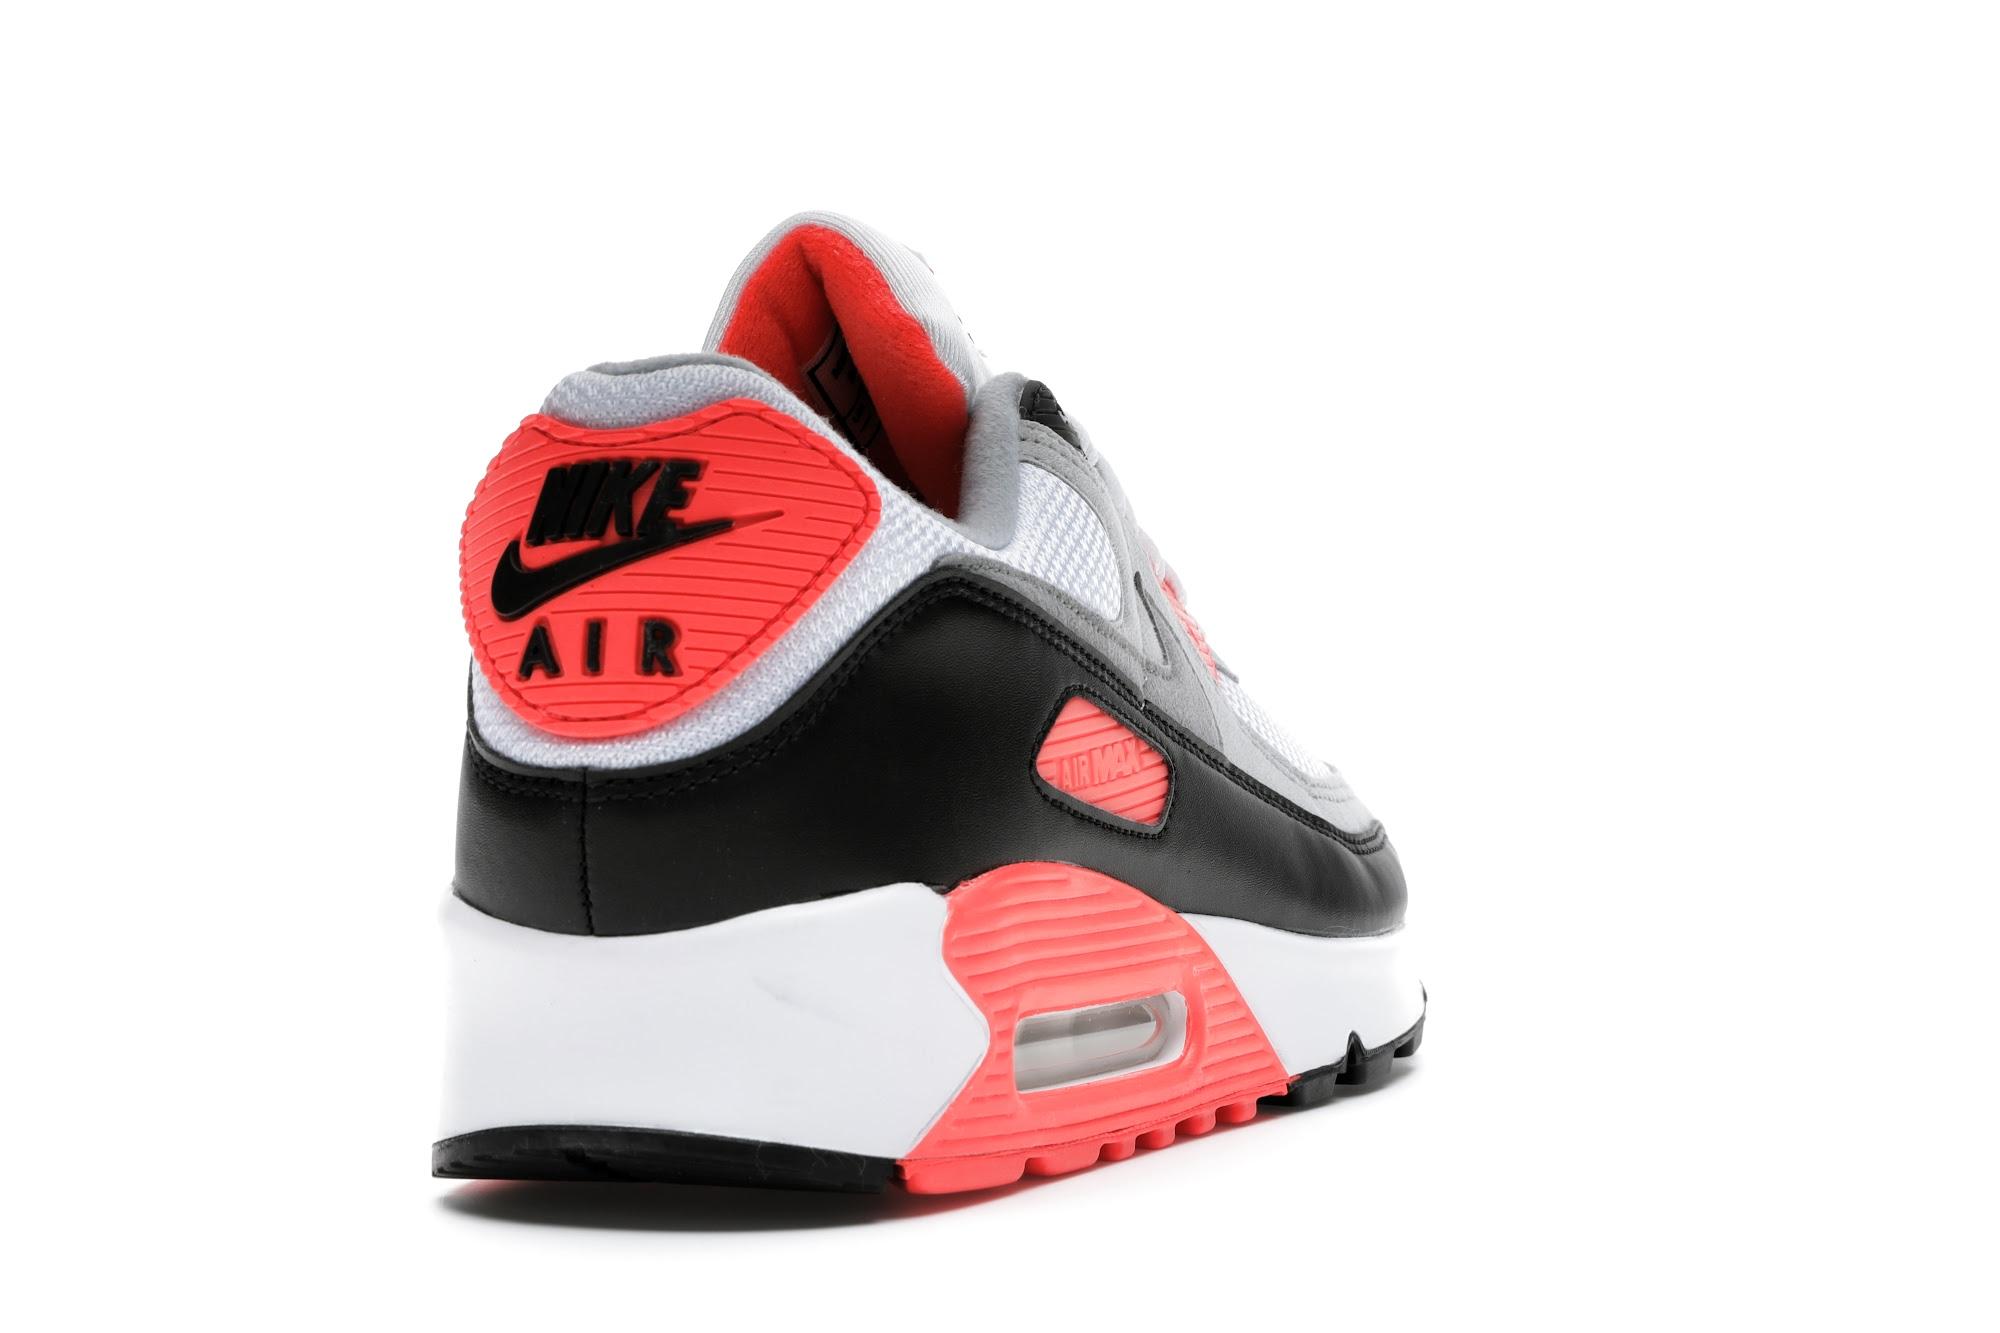 Nike Air Max 90 Infrared (2020) - CT1685-100